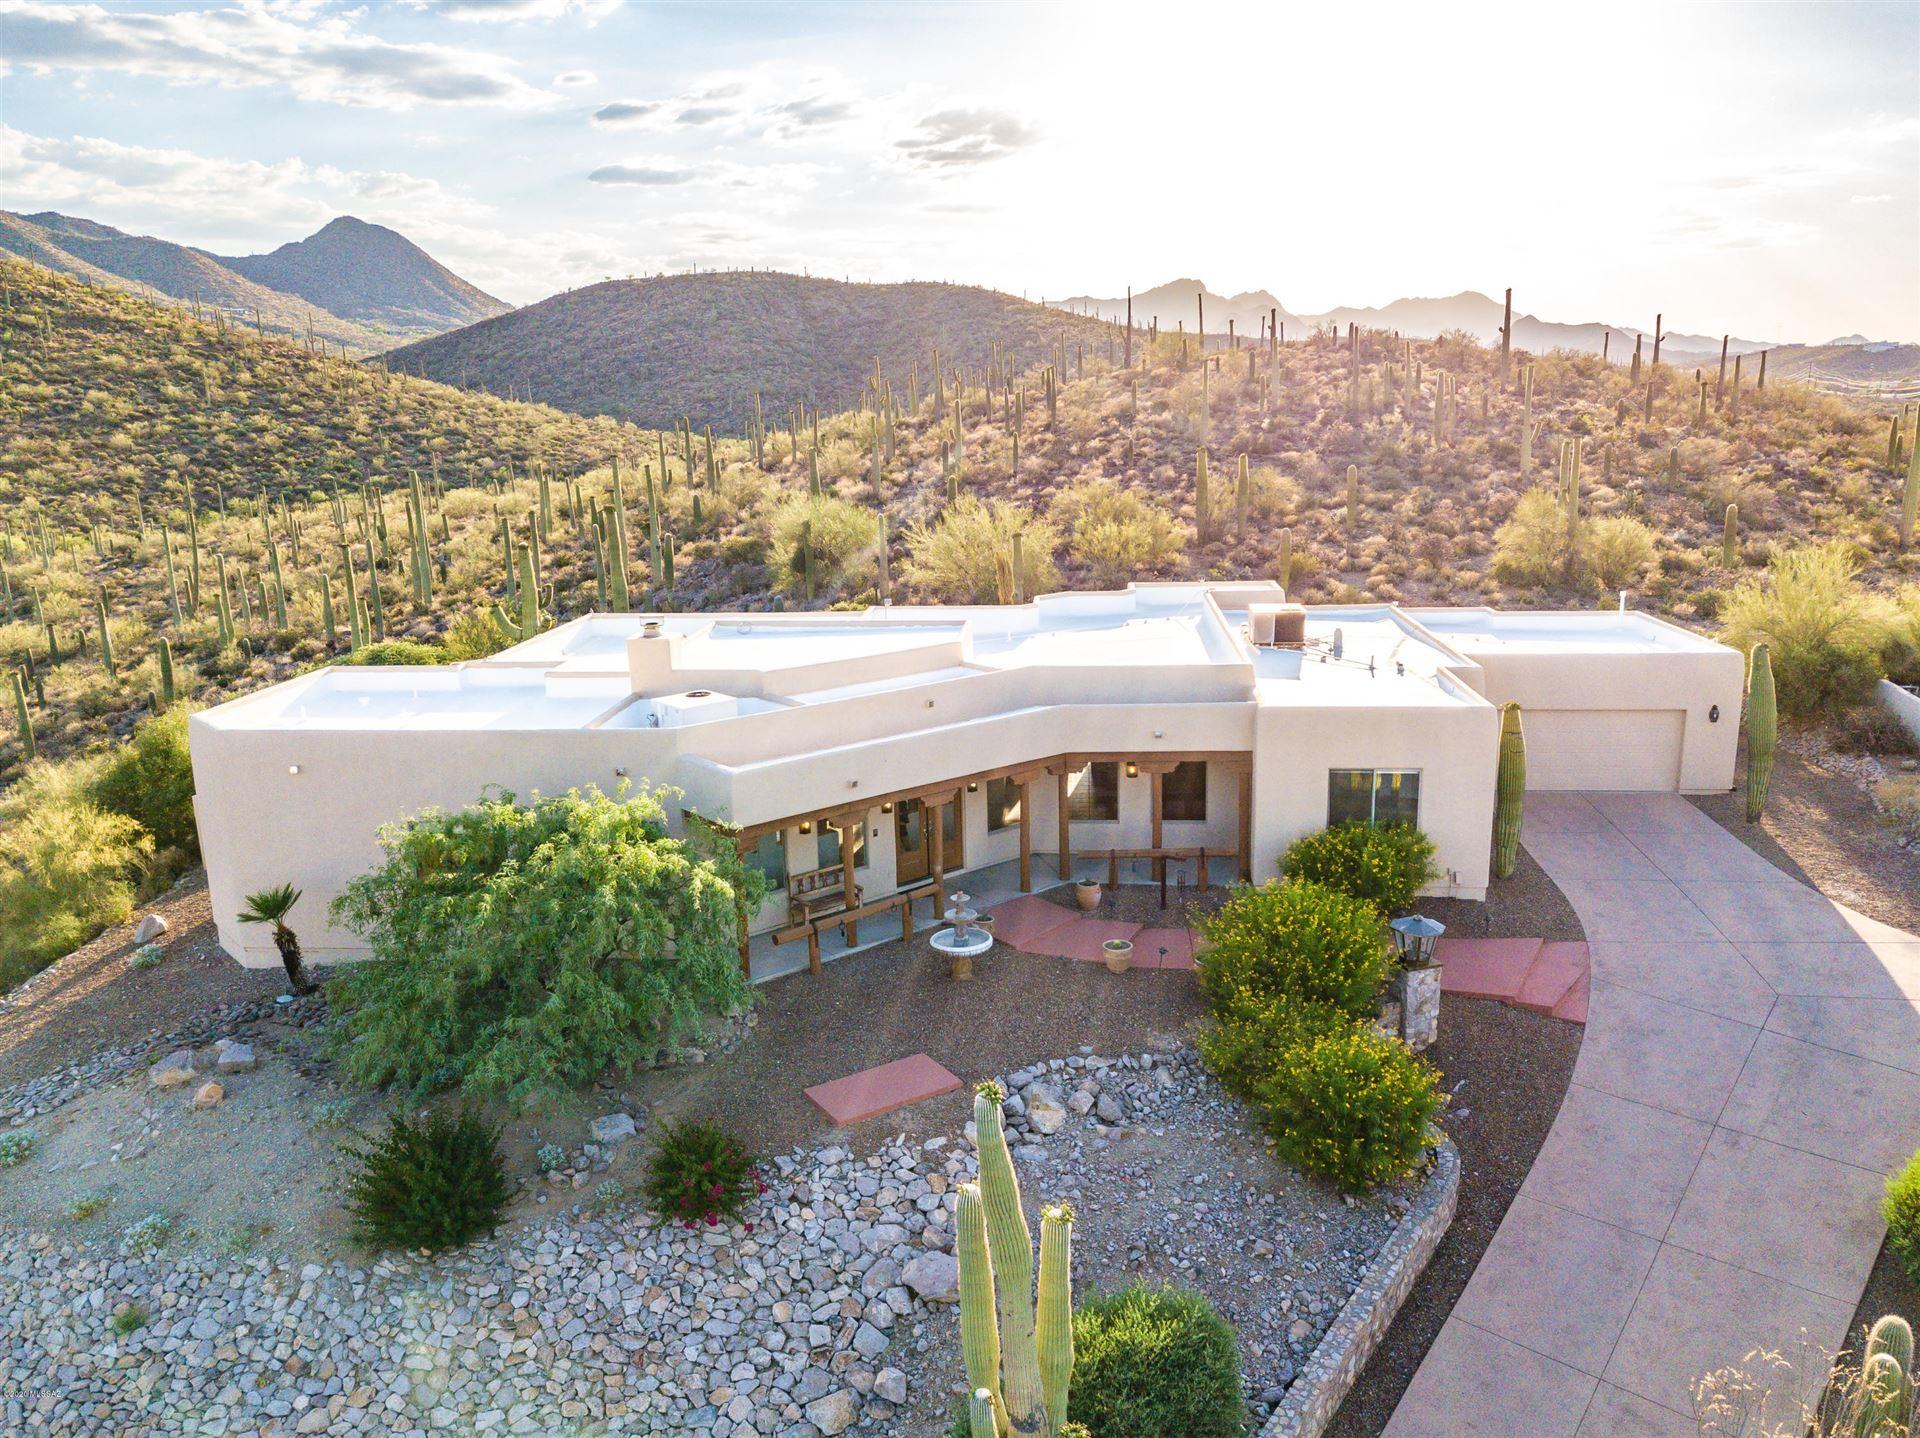 875 N Canyon Moonlight Place, Tucson, AZ 85745 - MLS#: 22014130